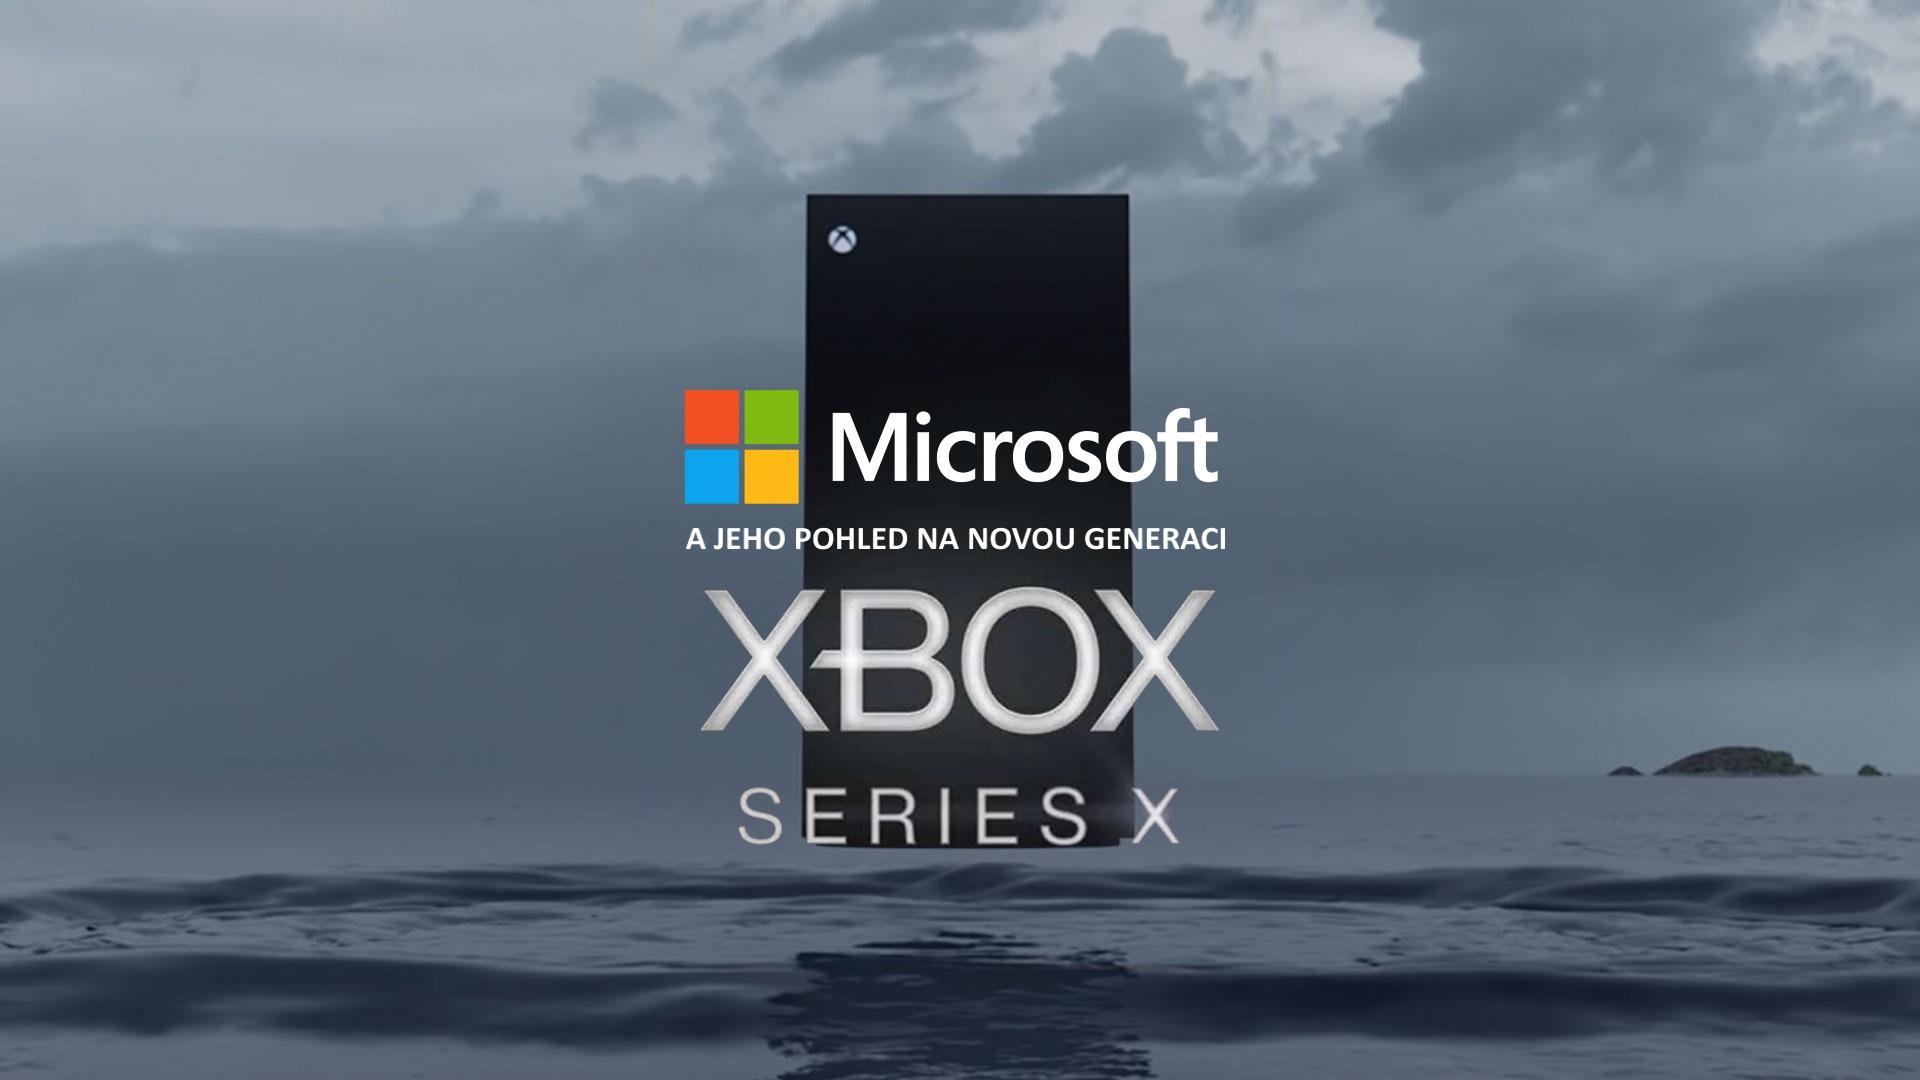 Microsoft a jeho pohled na novou generaci Xbox Series X